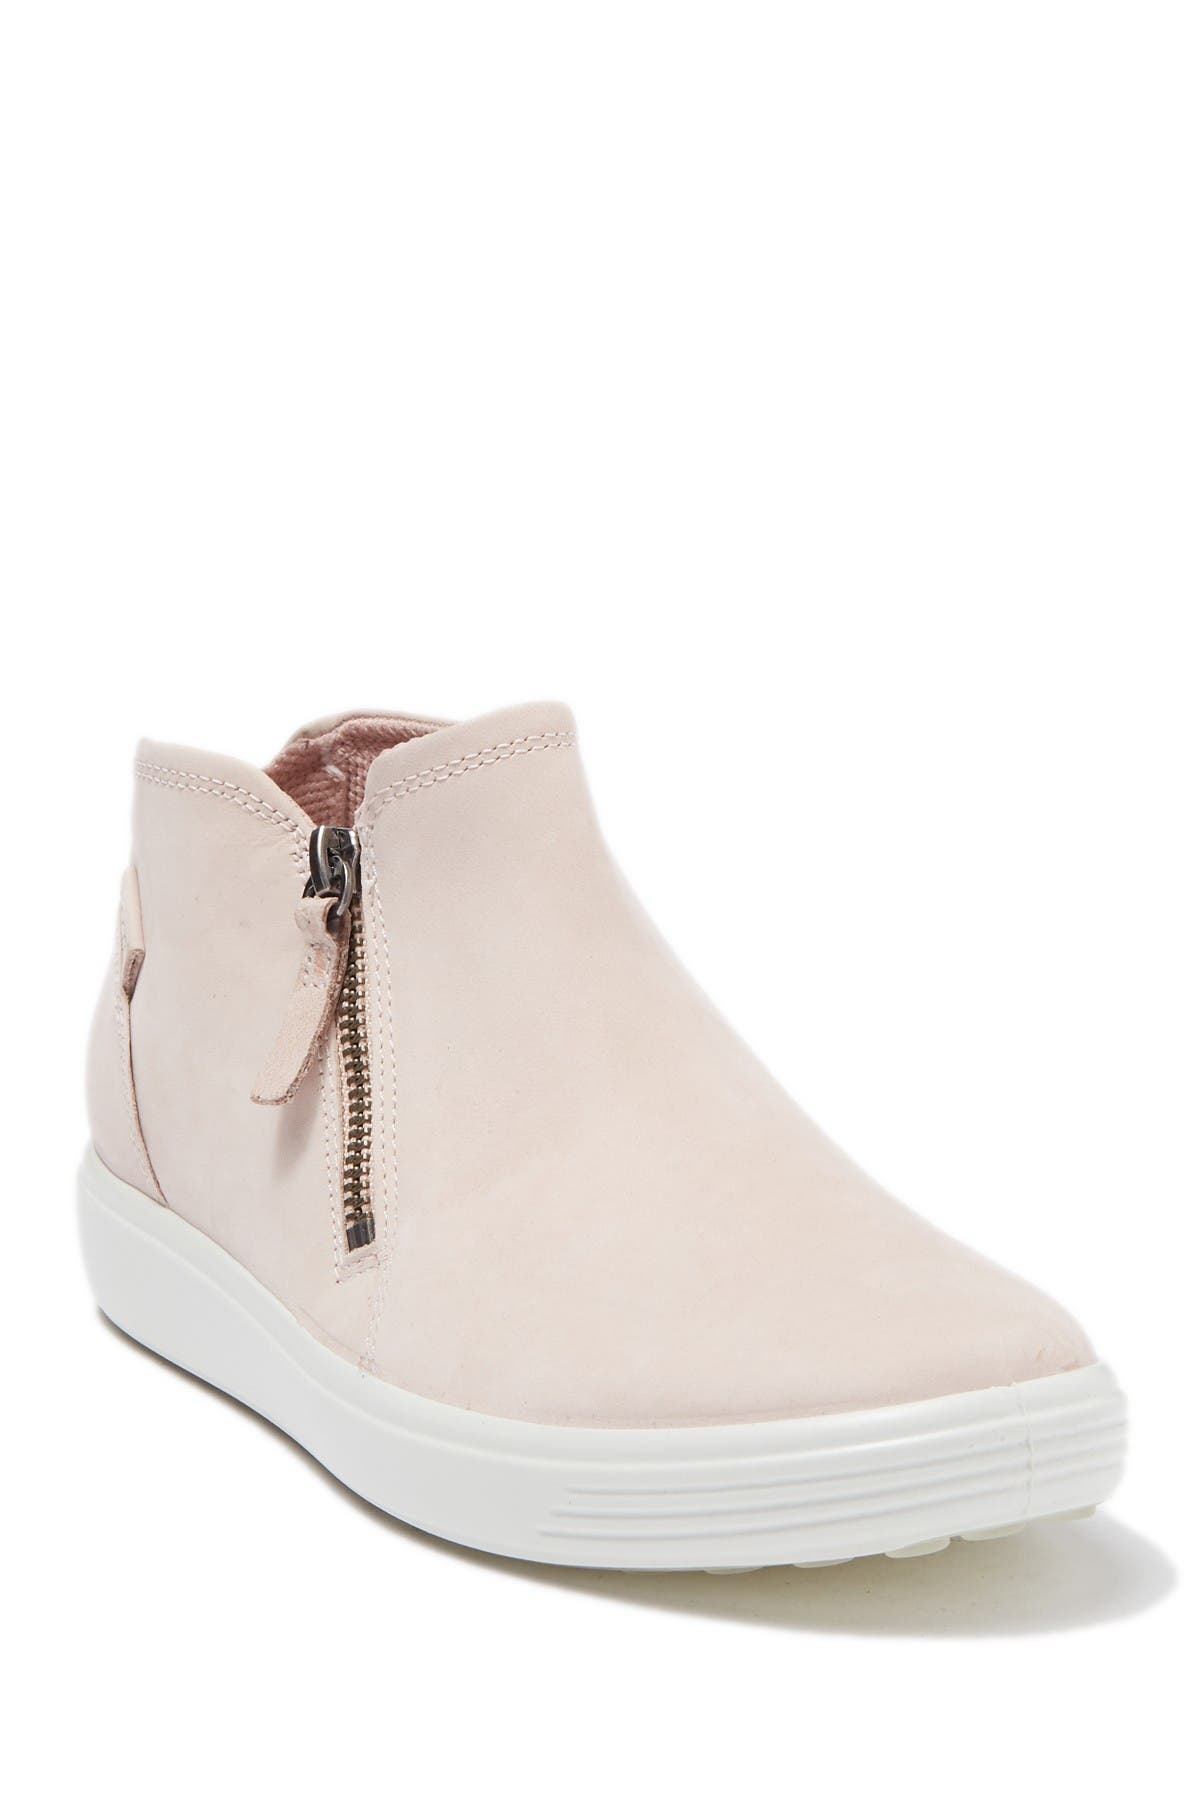 ECCO | Soft 7 Leather Zip Sneaker